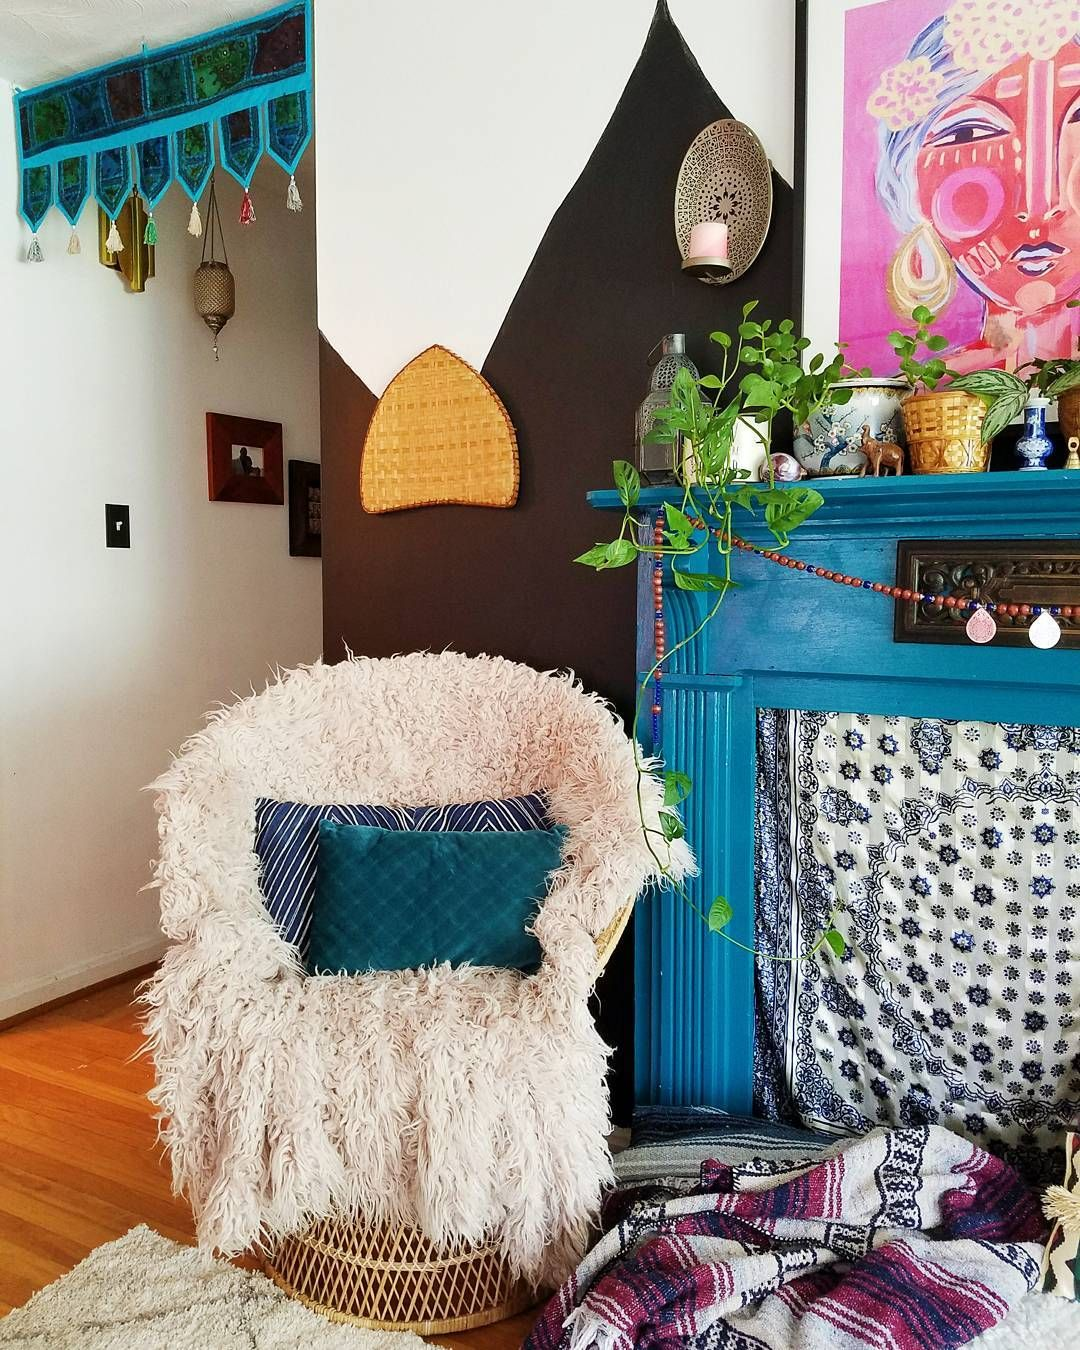 10 DIYS for boho style  Boho style decor, Diy home decor projects